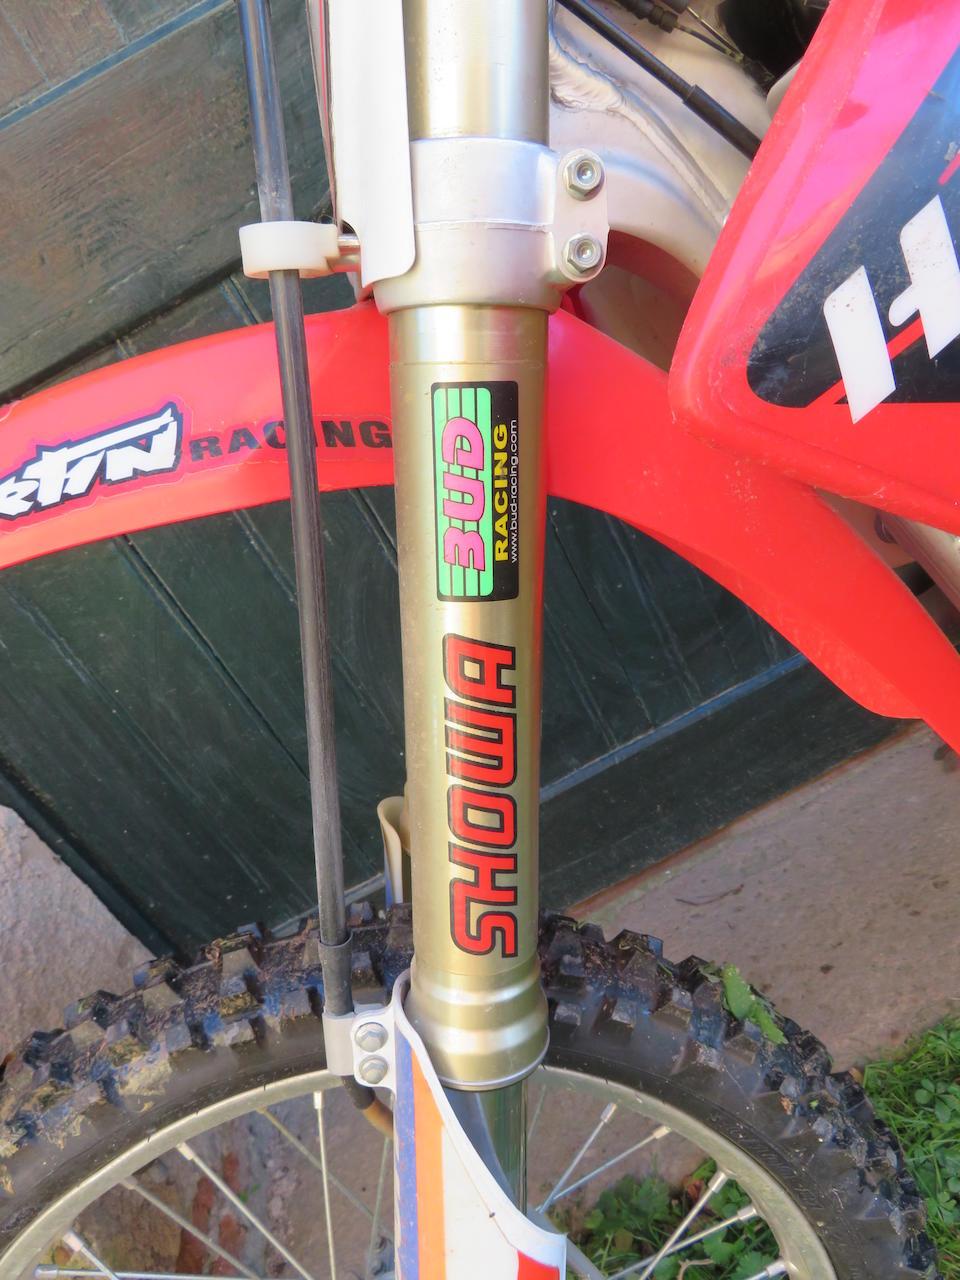 c.2005 Honda 449cc CRF450R Frame no. JH2PE05AX5M302324 Engine no. PE05E-2311054